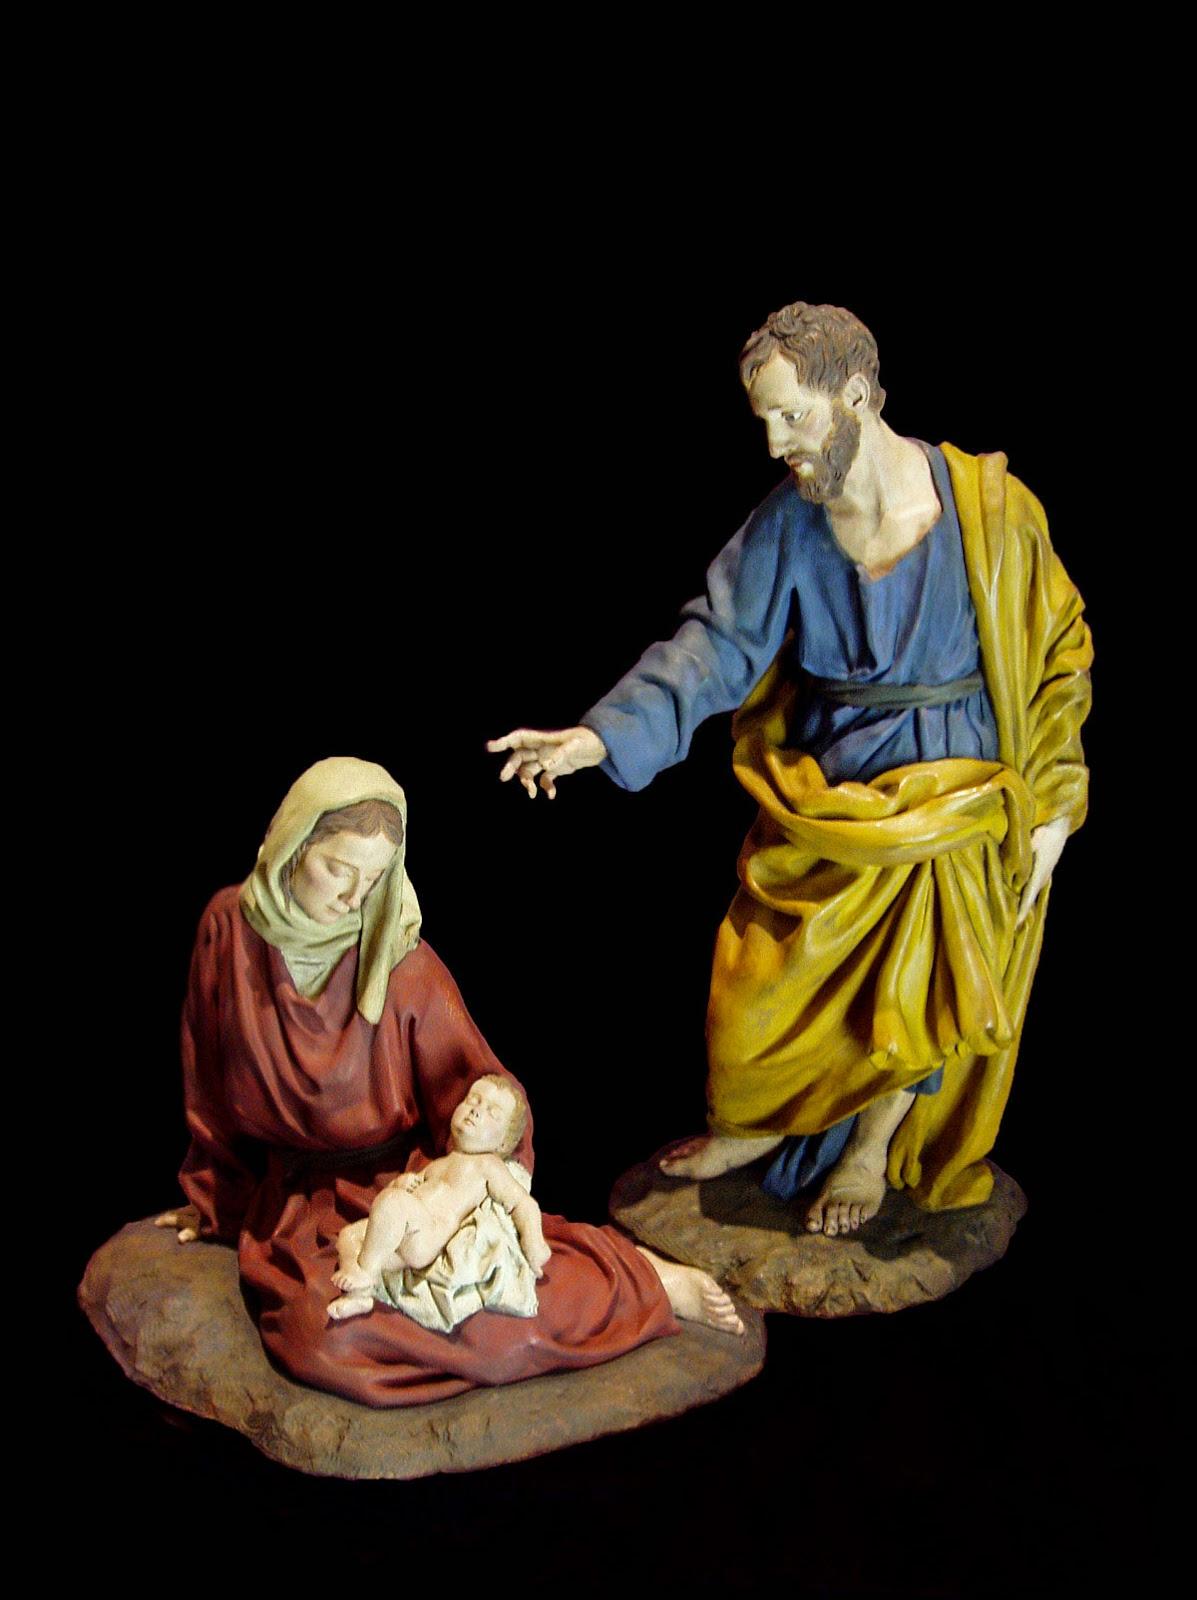 Nacimiento Belén Nativity krippe presepe Arturo Serra Gómez Barro cocido 1